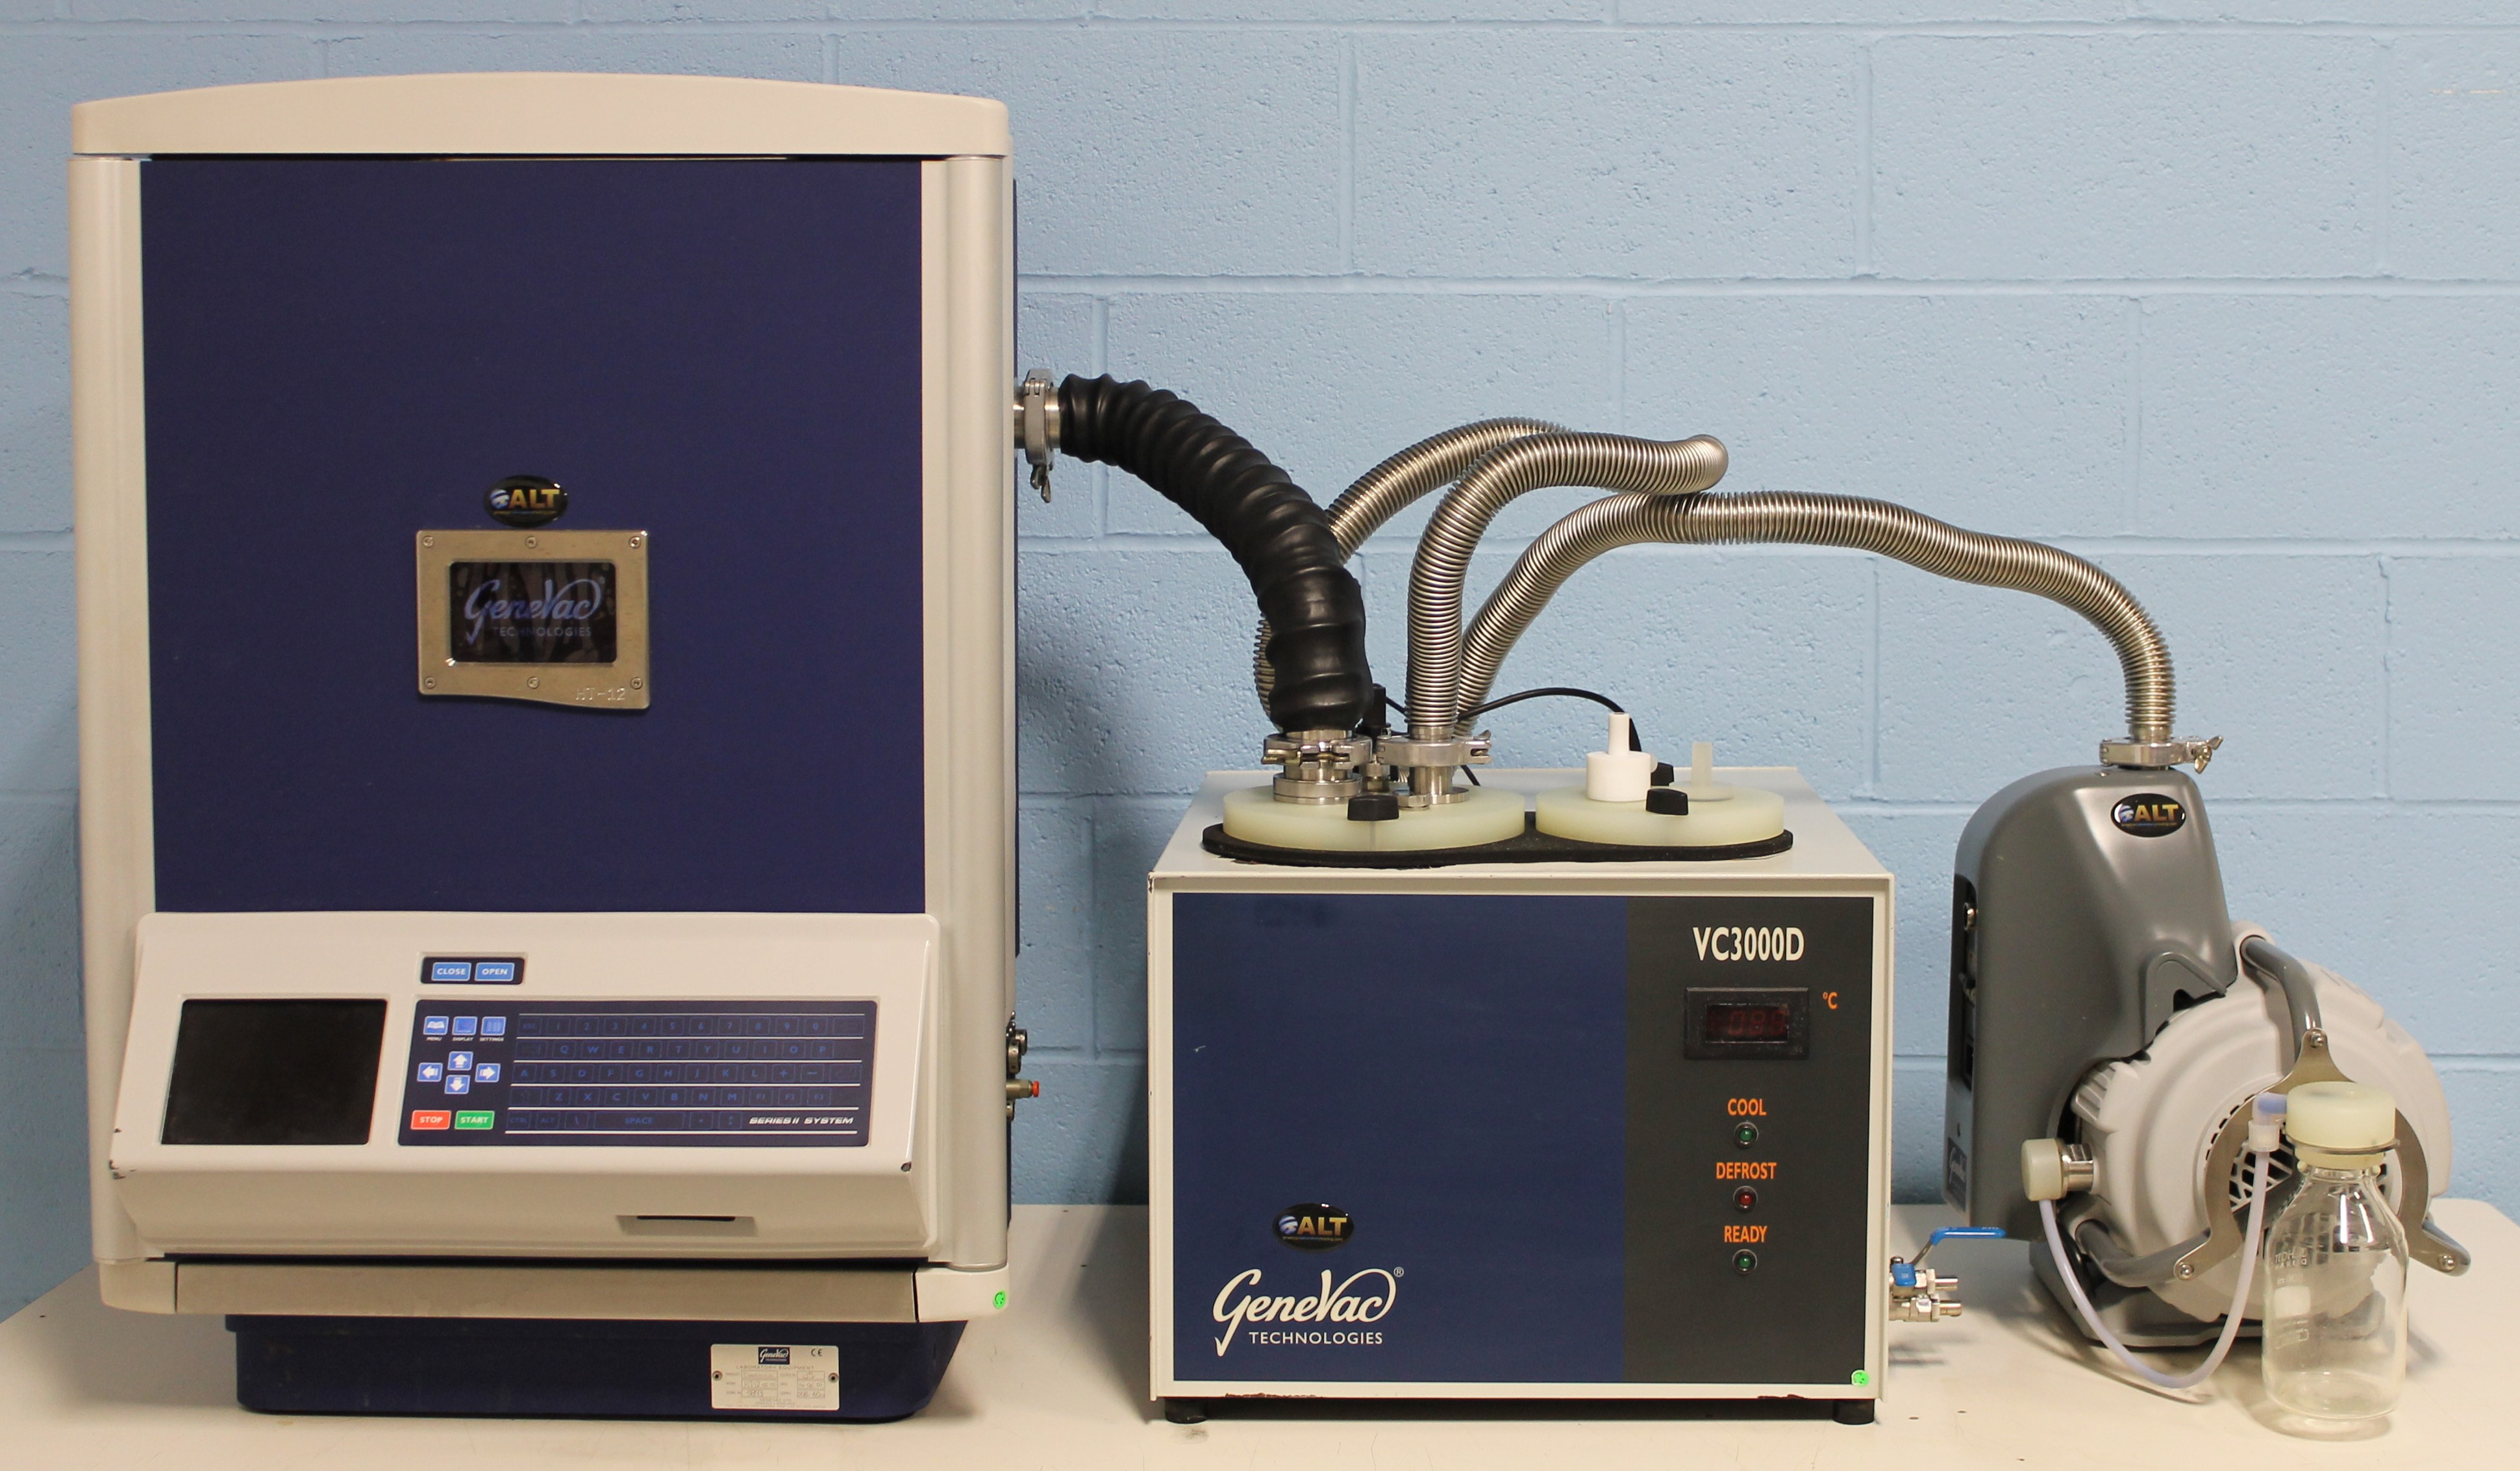 GeneVac HT-12 Series II Evaporation System Image